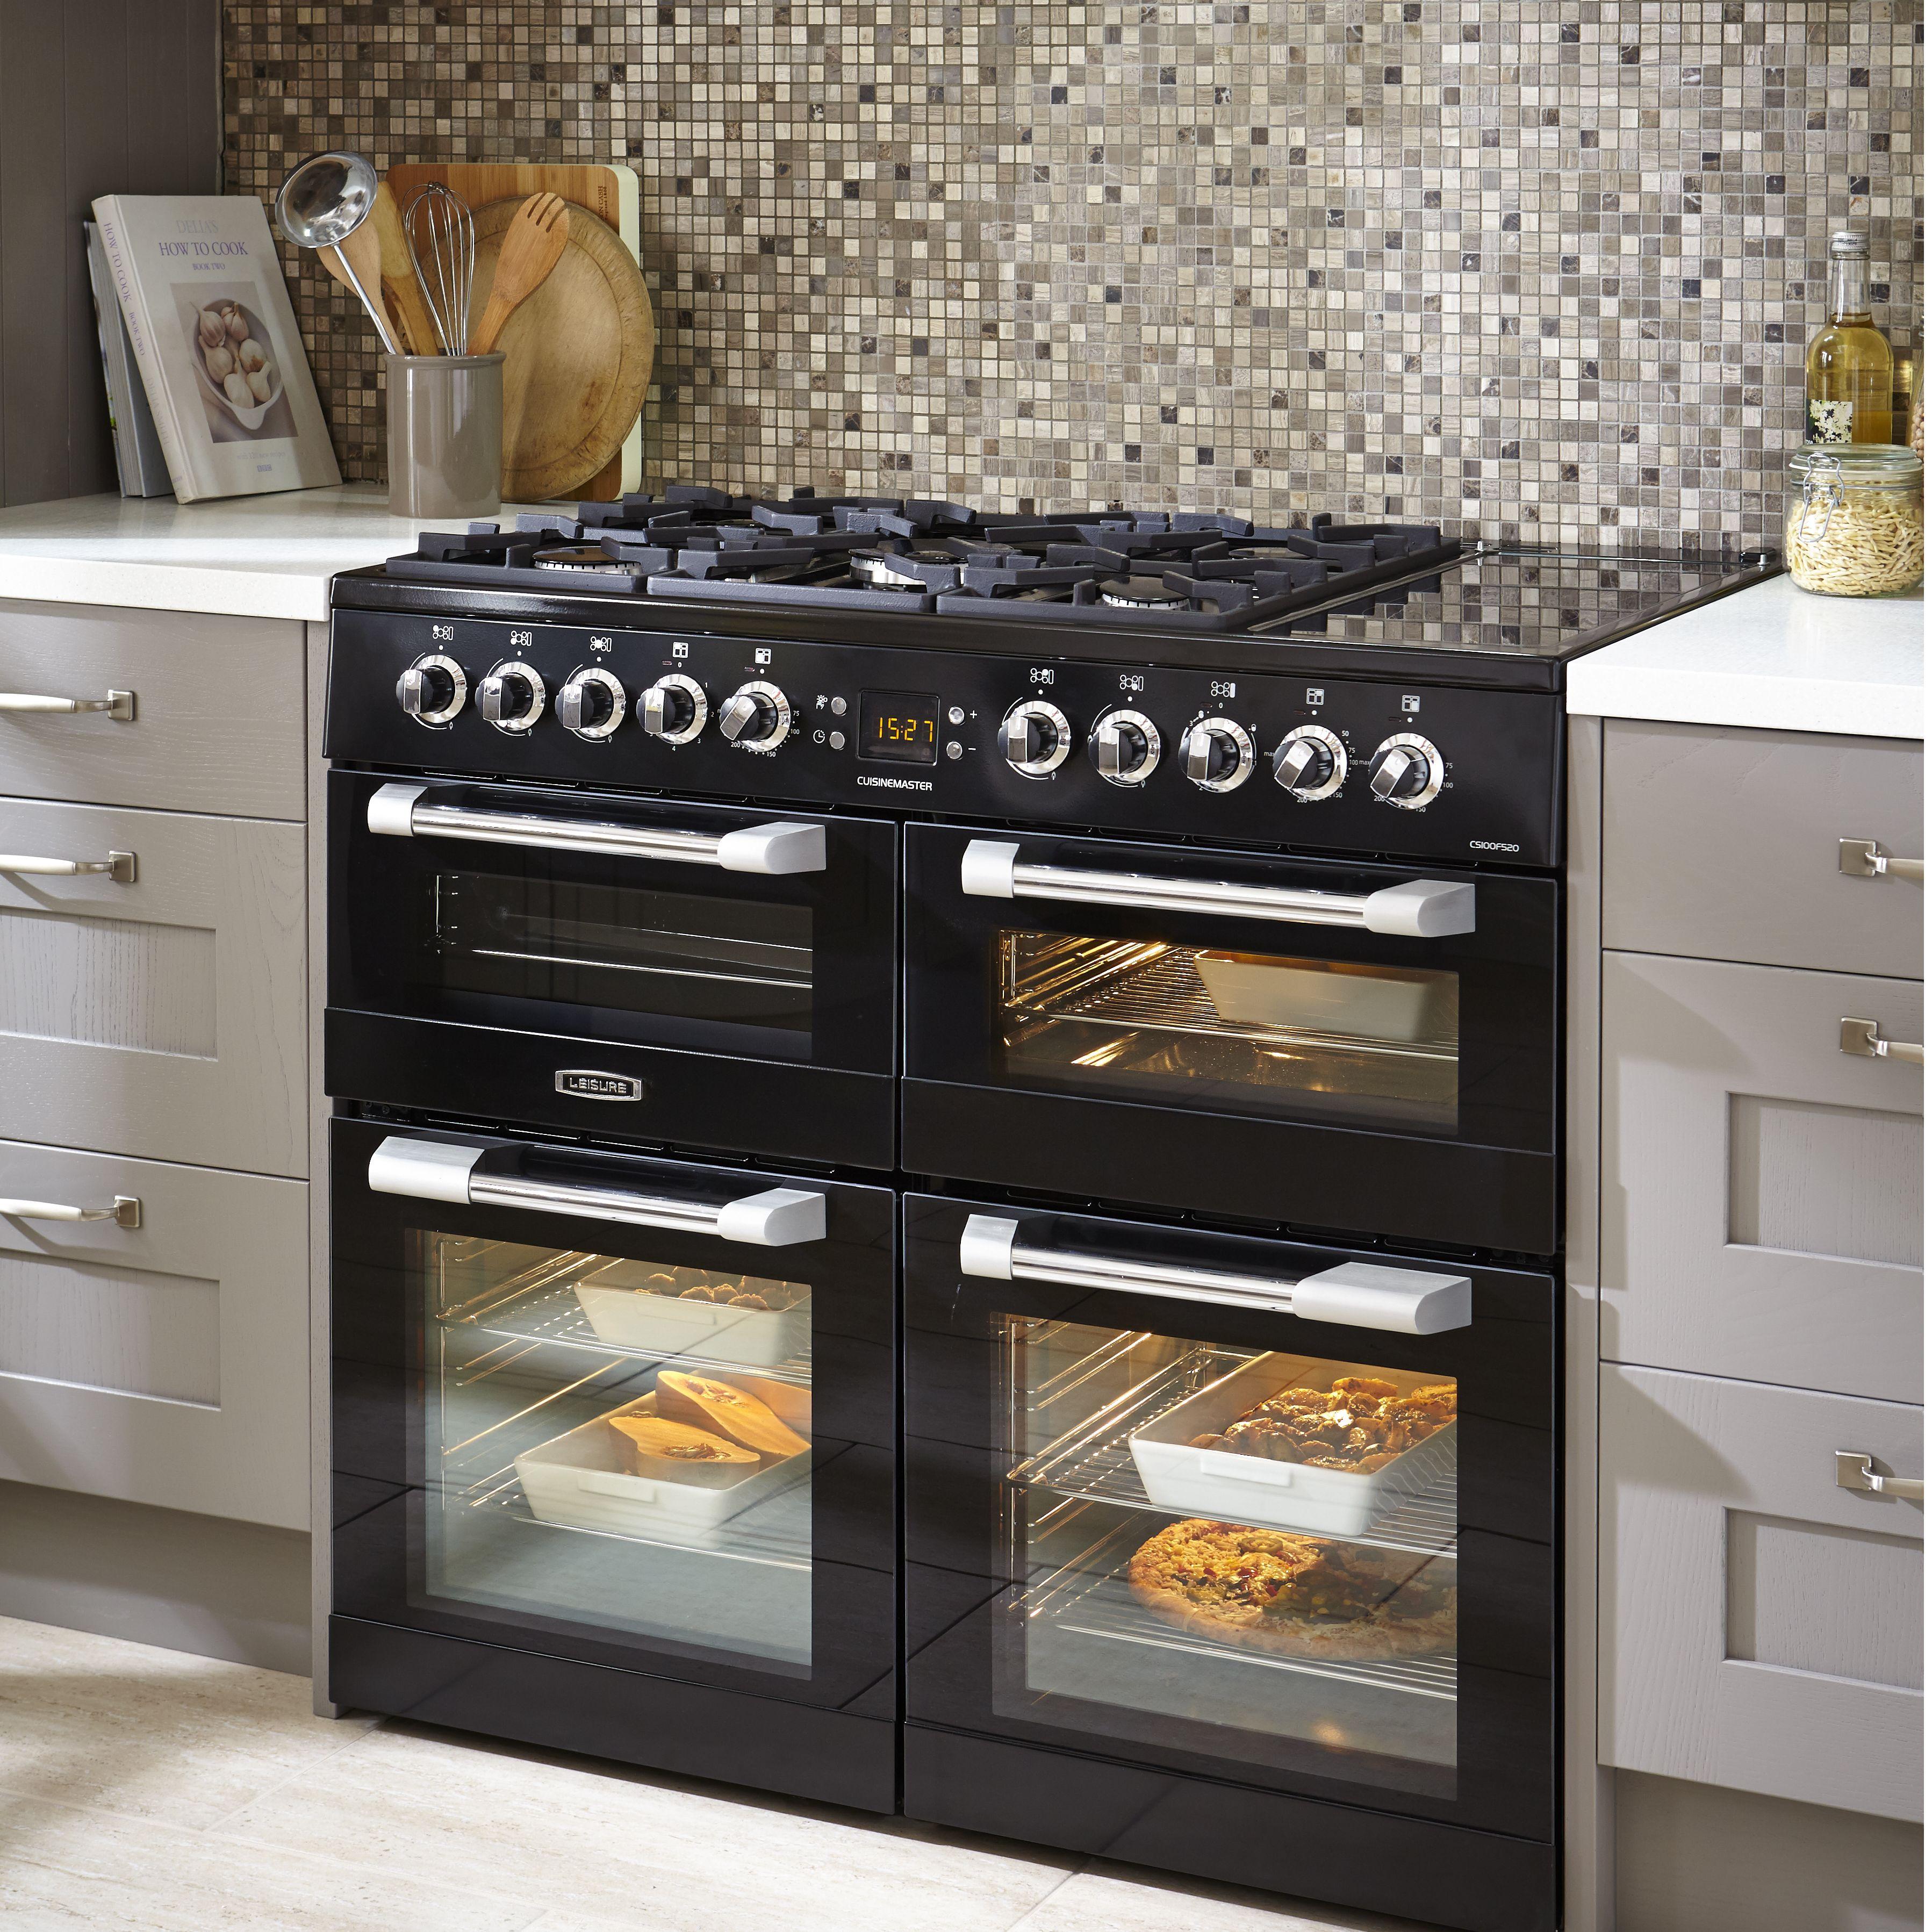 15 Outstanding Industrial Kitchens: Industrial Kitchen Design Ideas